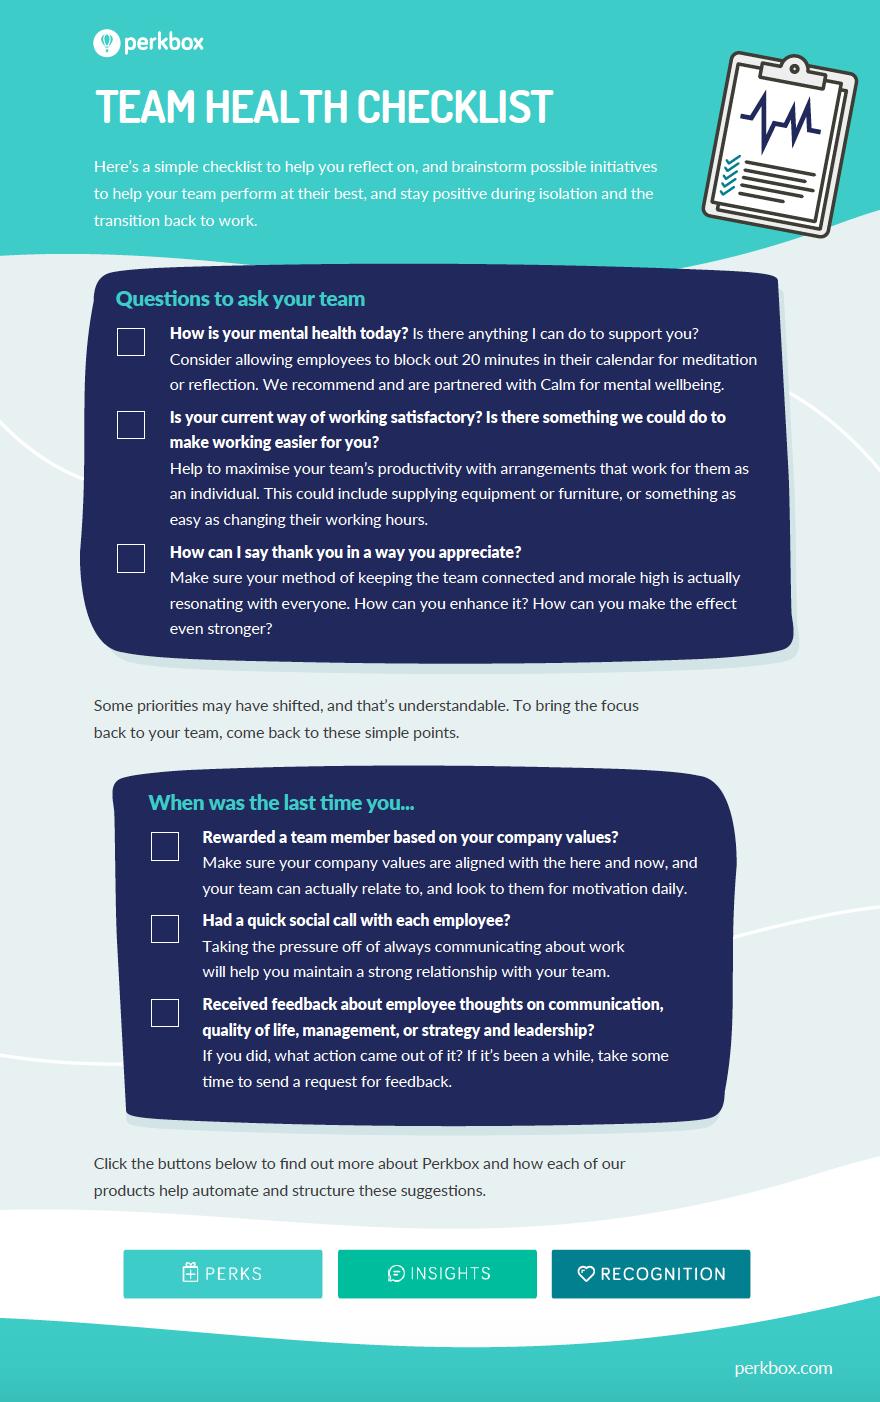 Team health checklist